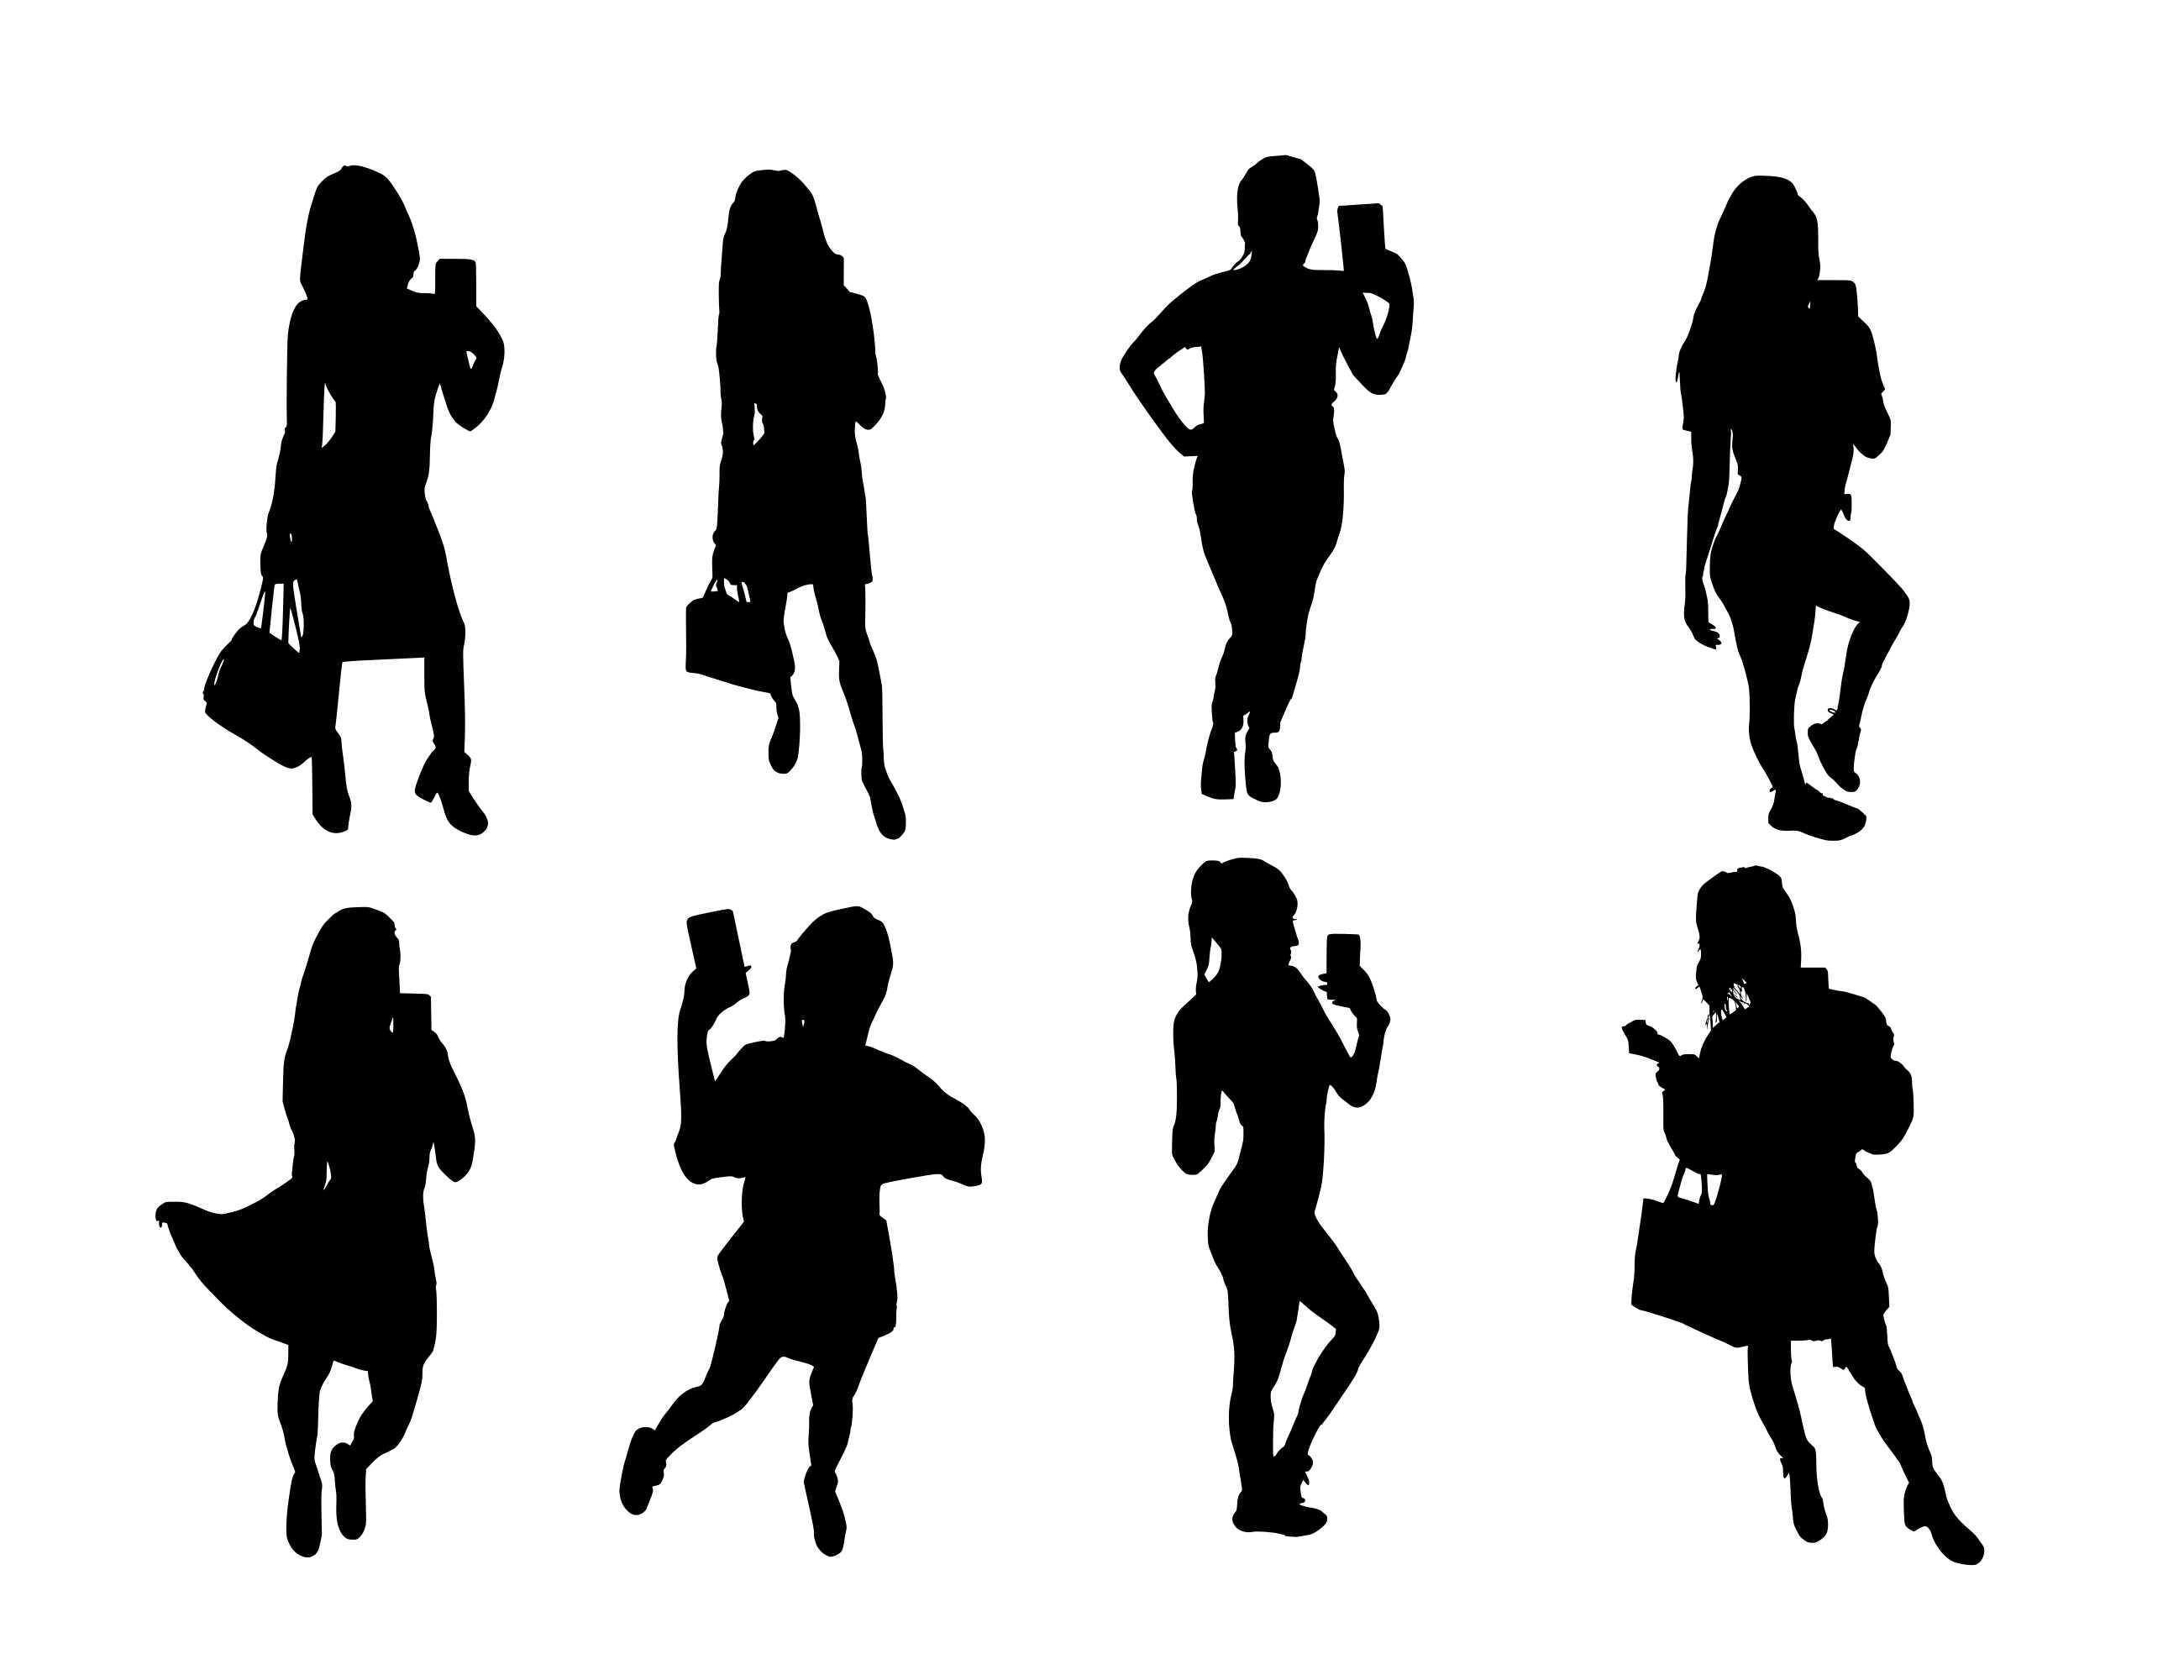 8-woman-taking-selfie-silhouette-cover.jpg